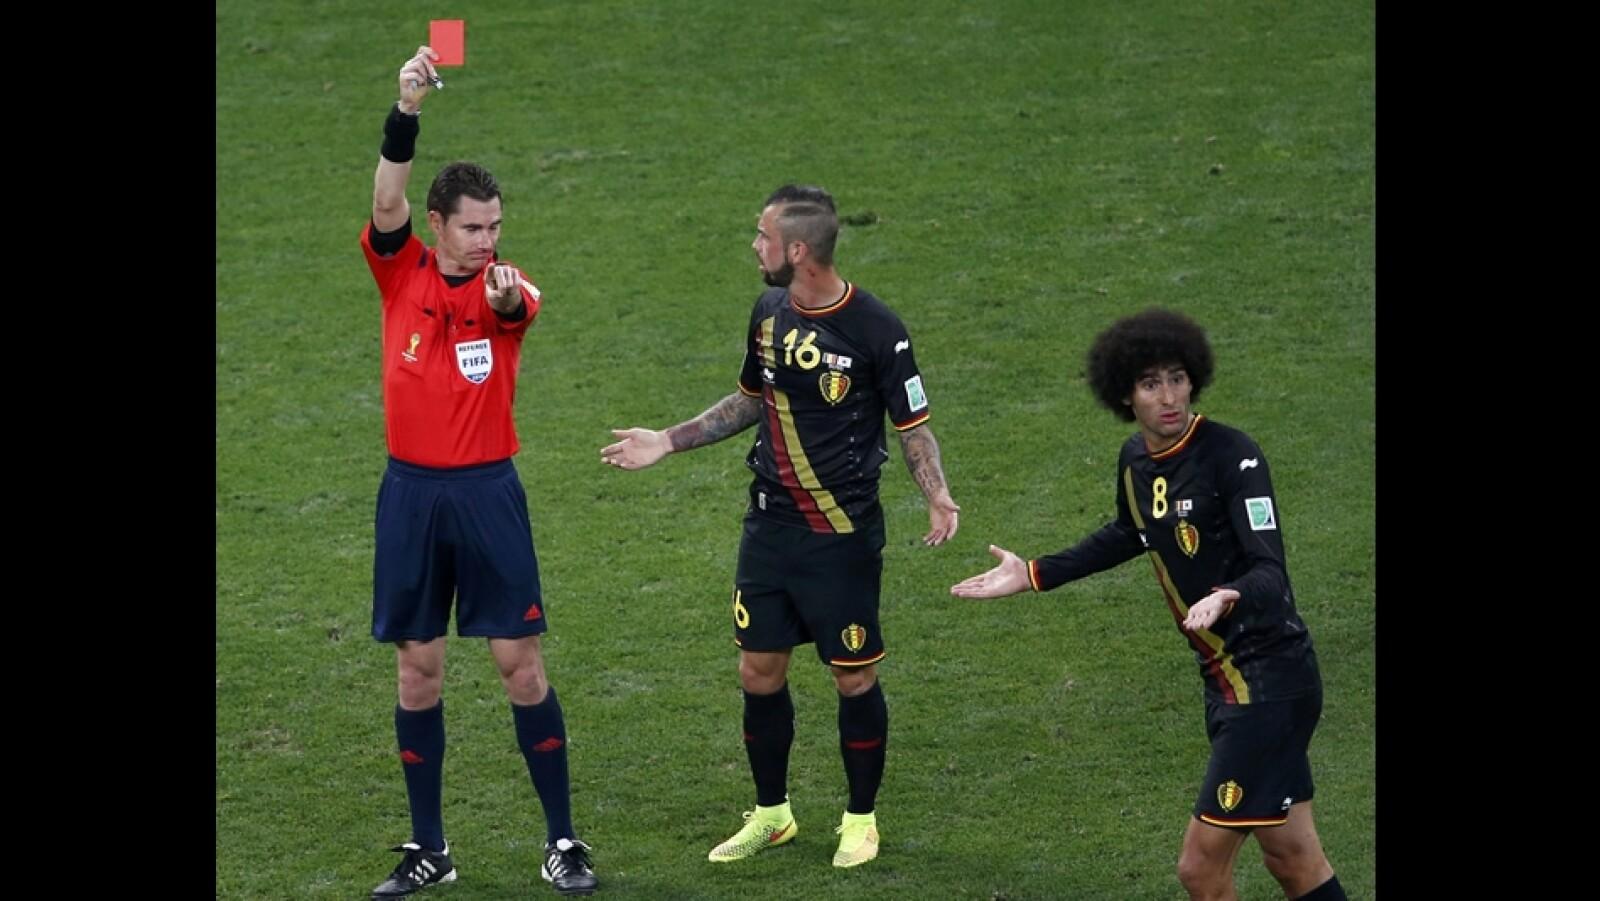 Corea del Sur vs Bélgica